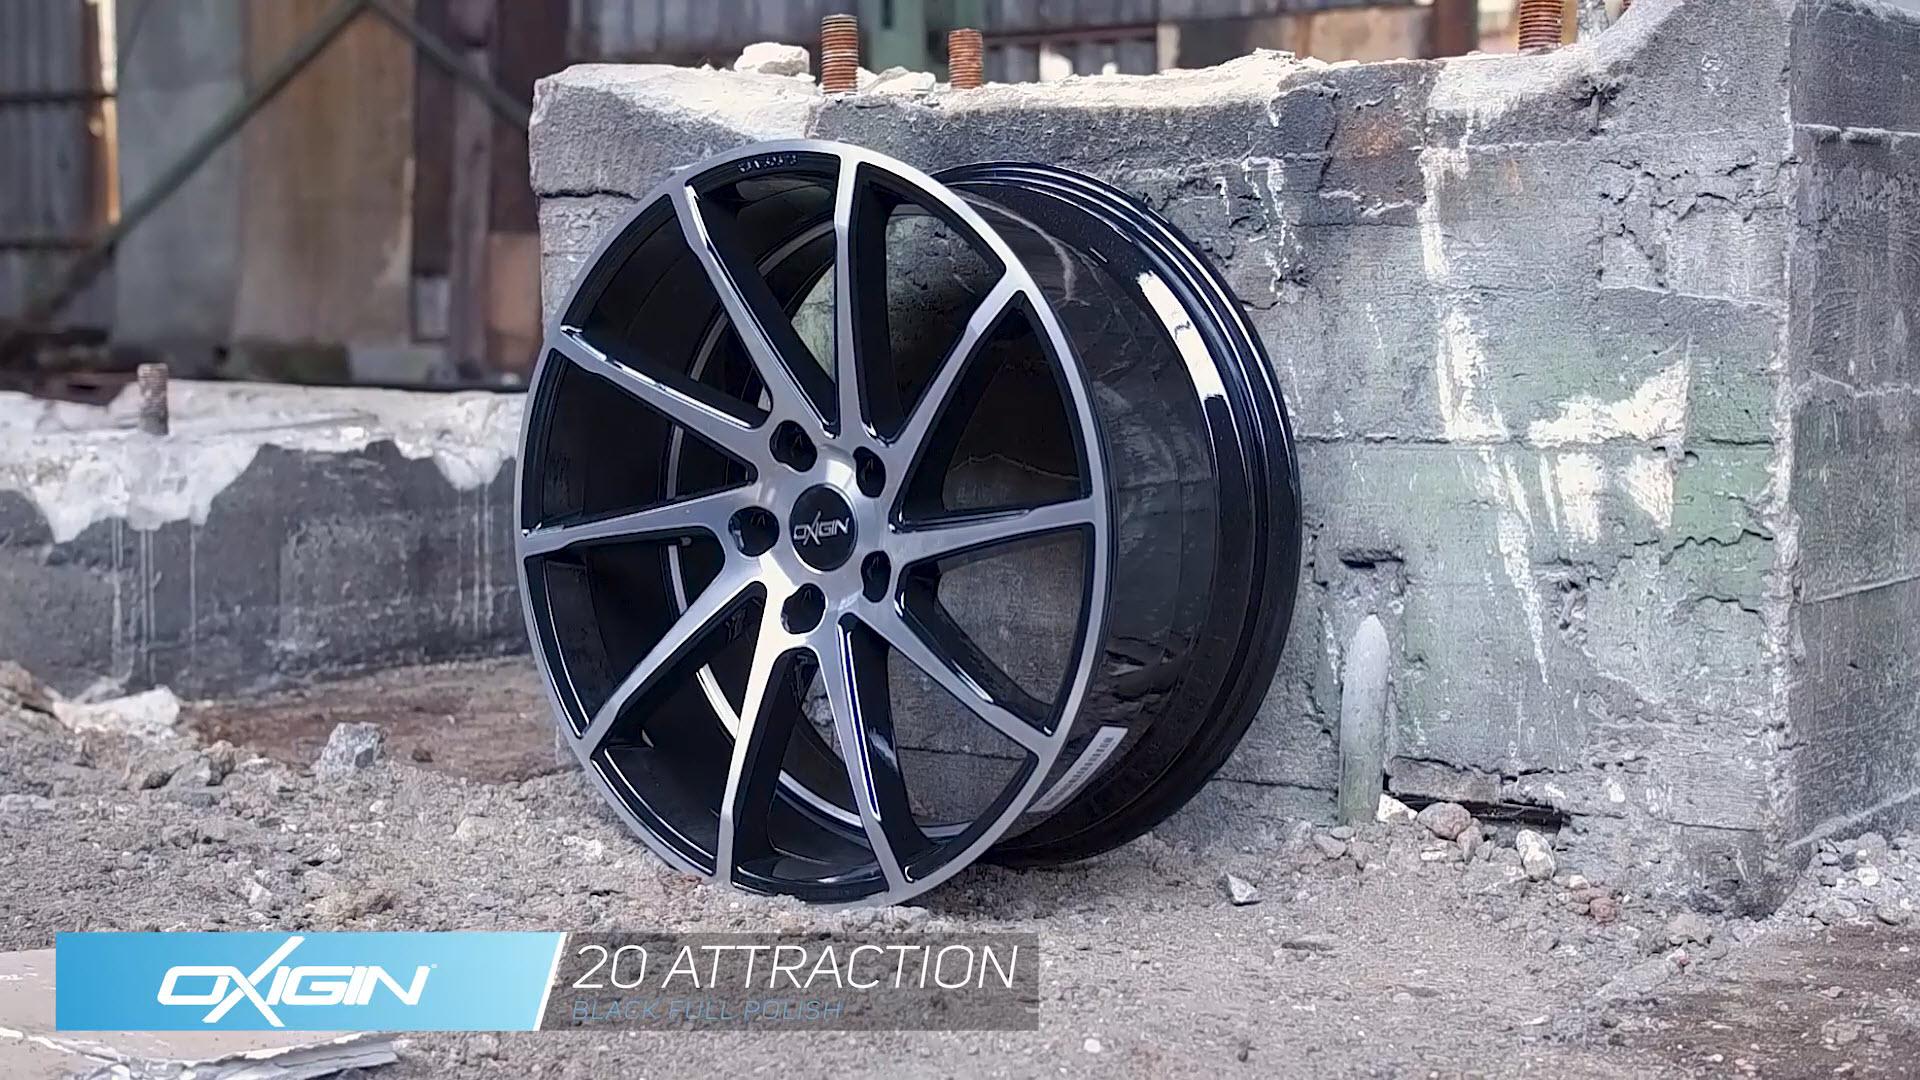 OX 20 Attraction Black Full Polish und Ambiente